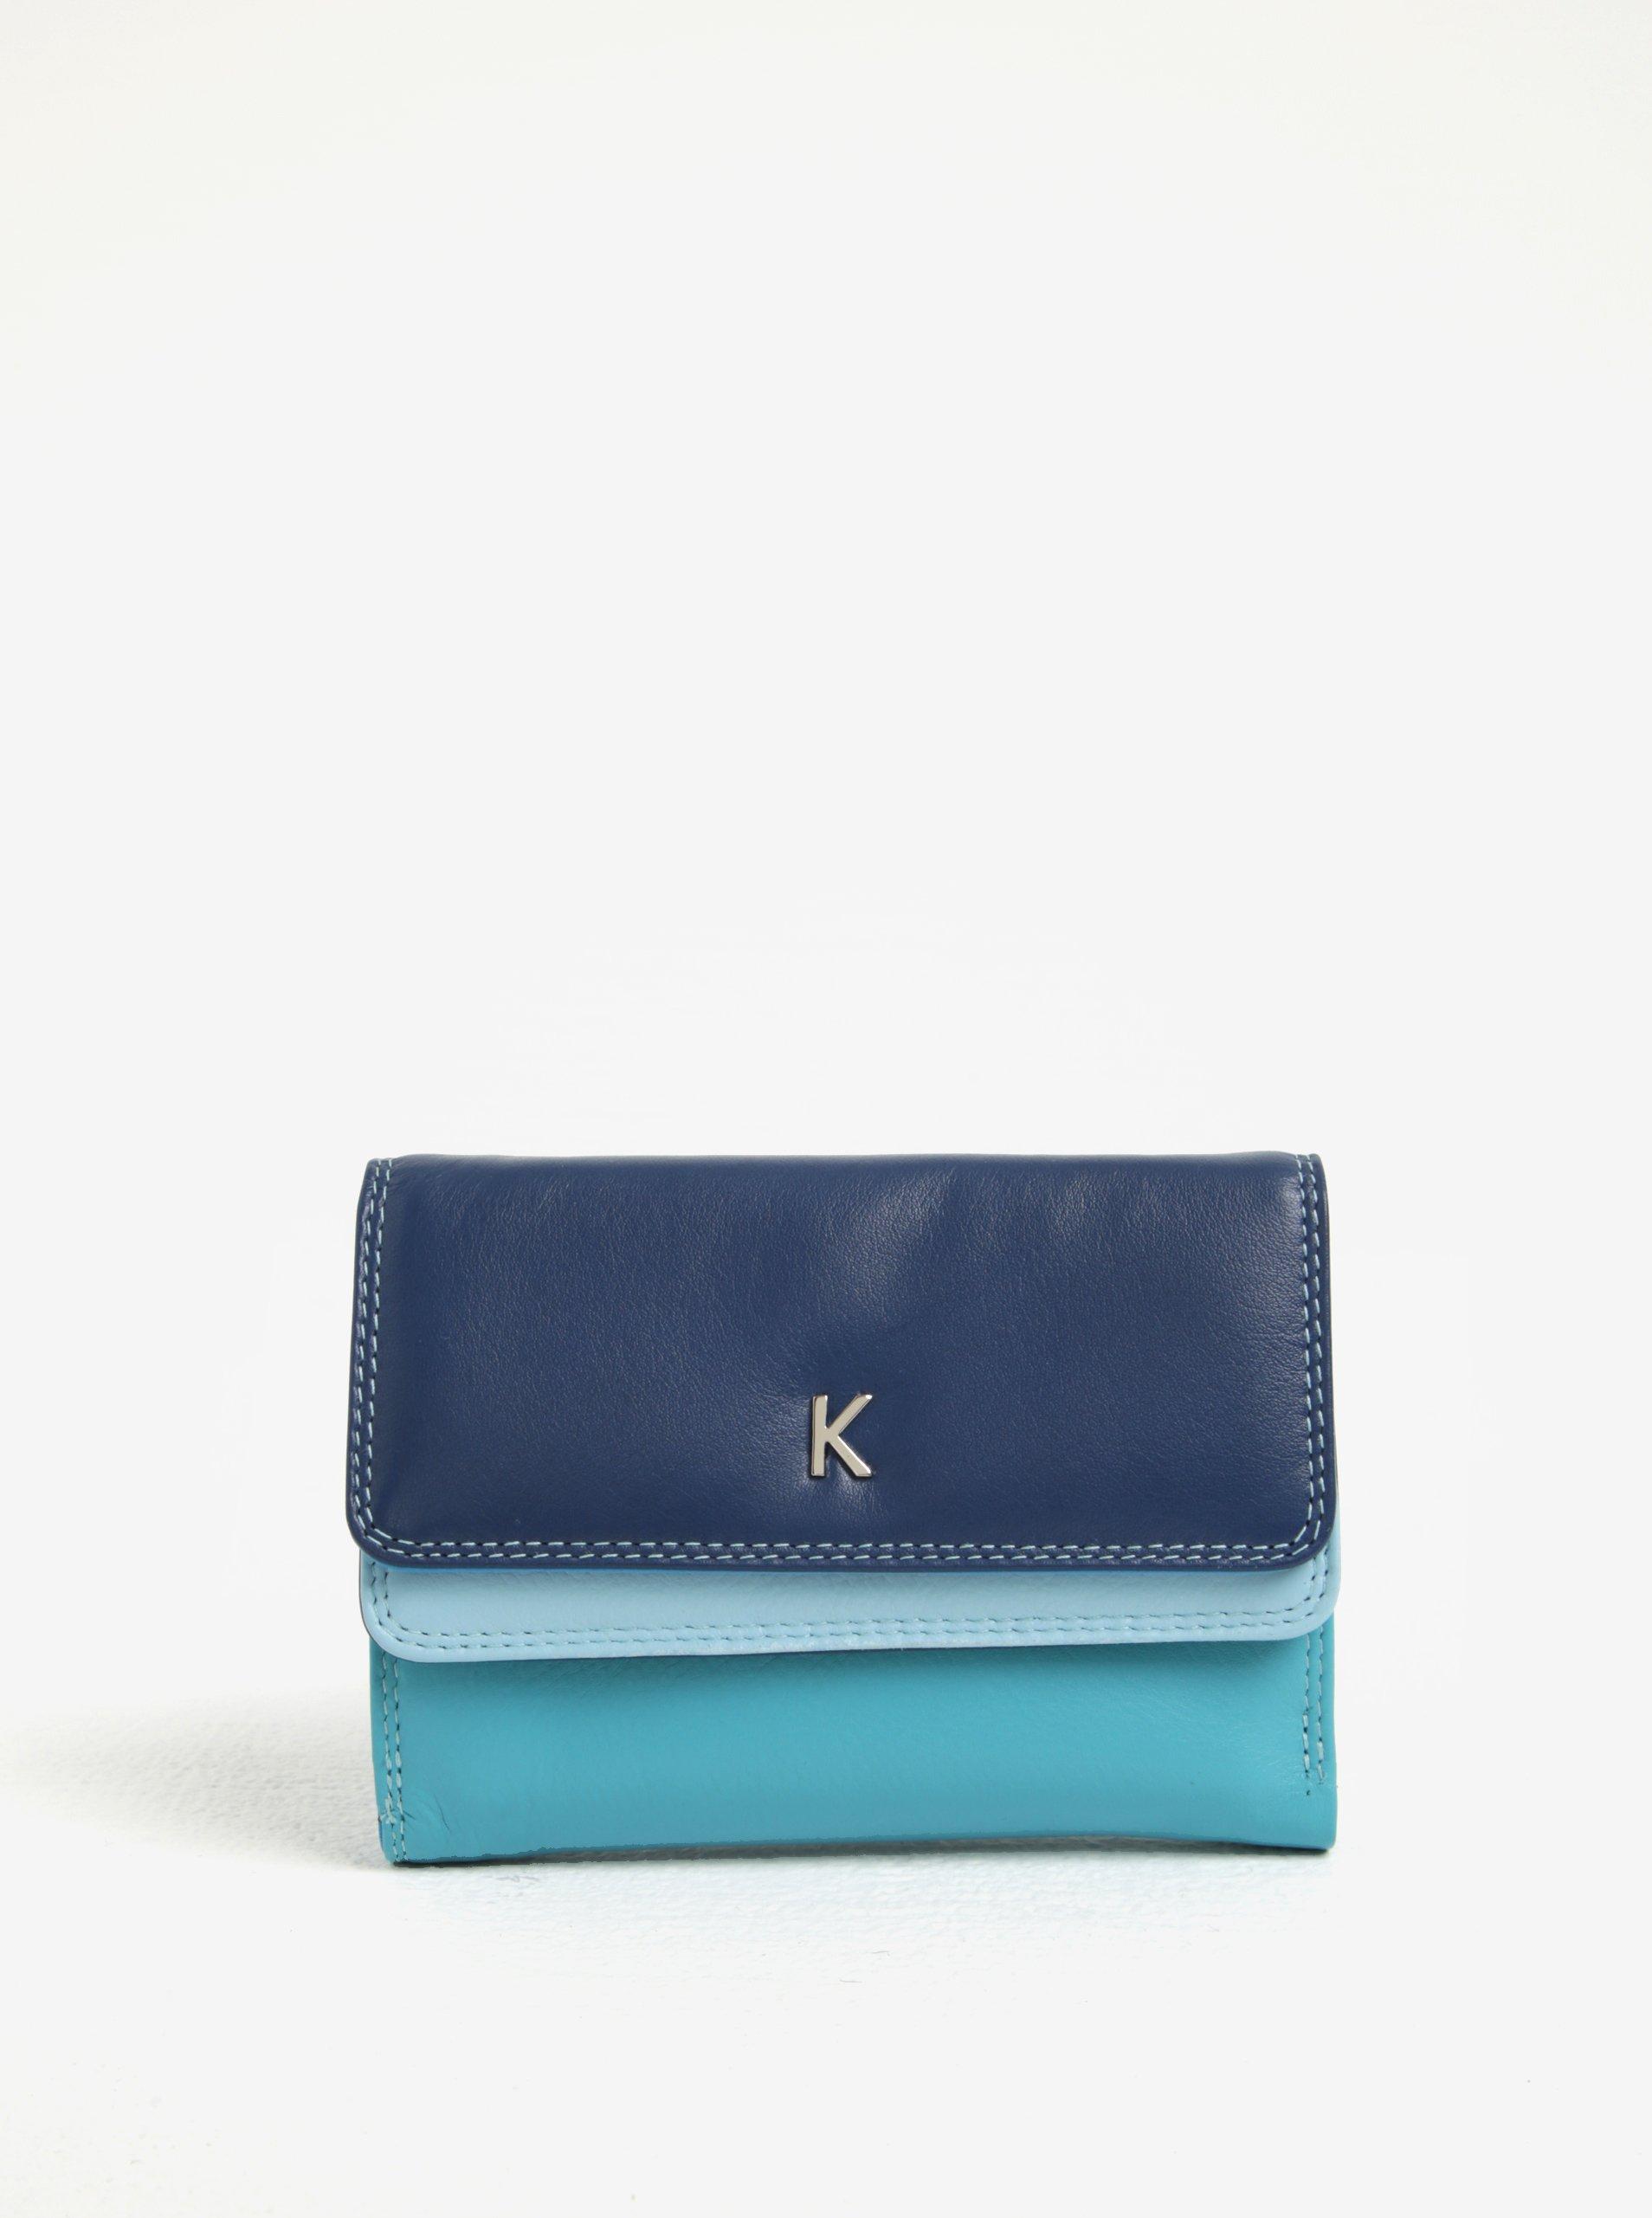 Modrá dámská kožená peněženka KARA